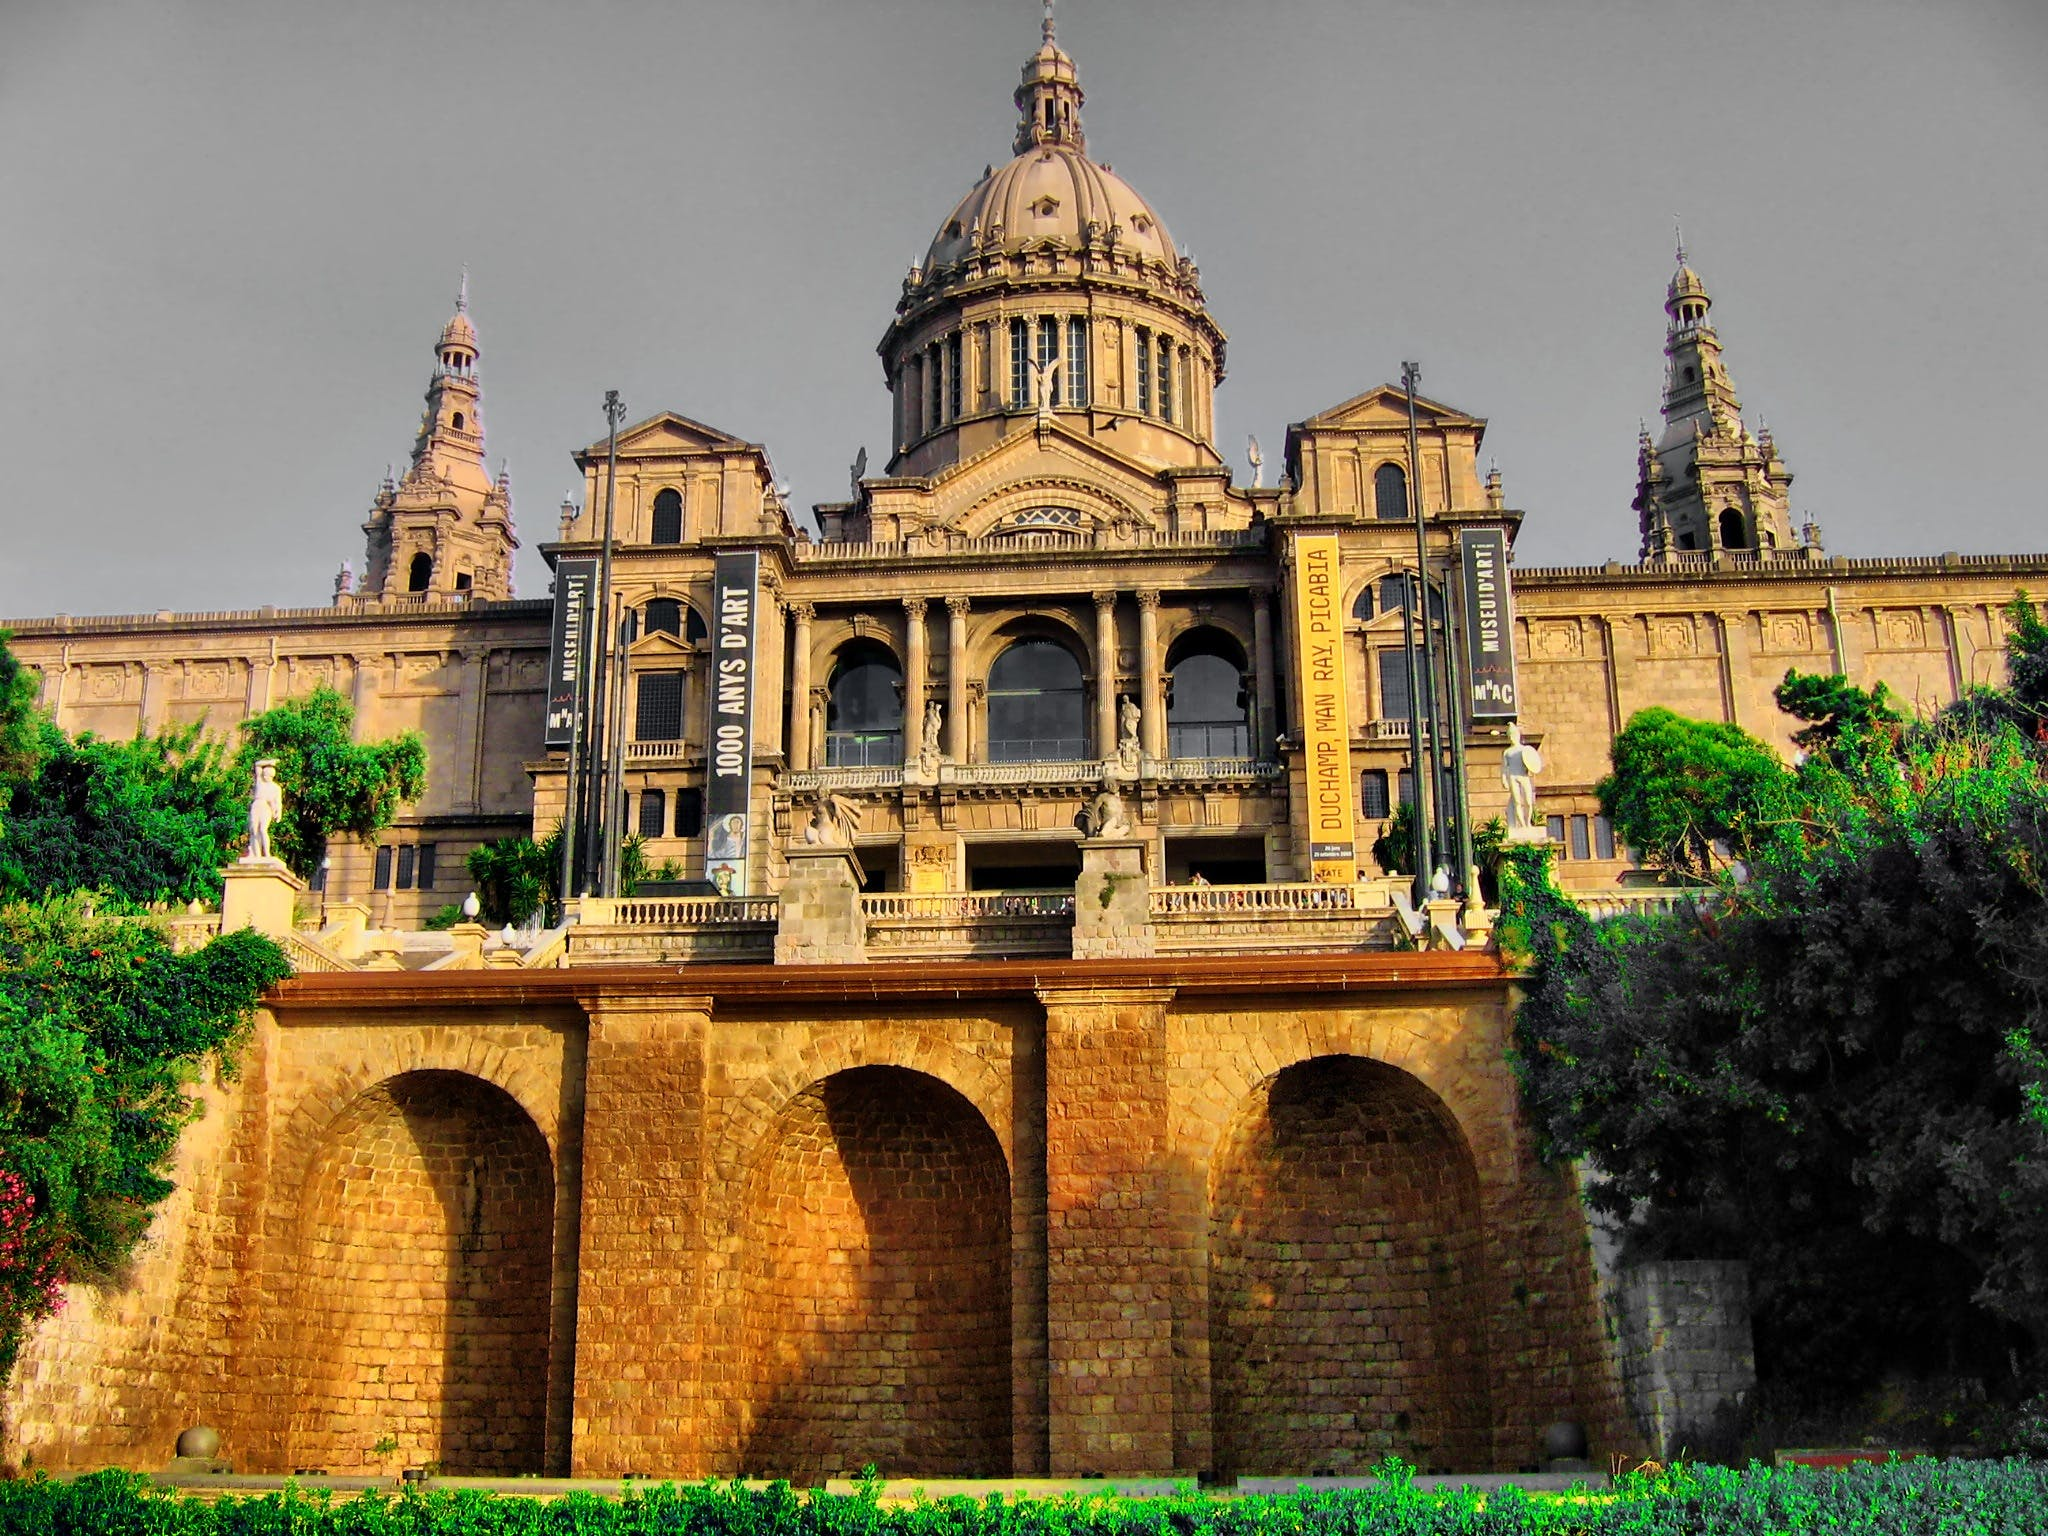 Free stock photo of landmark, building, architecture, spain